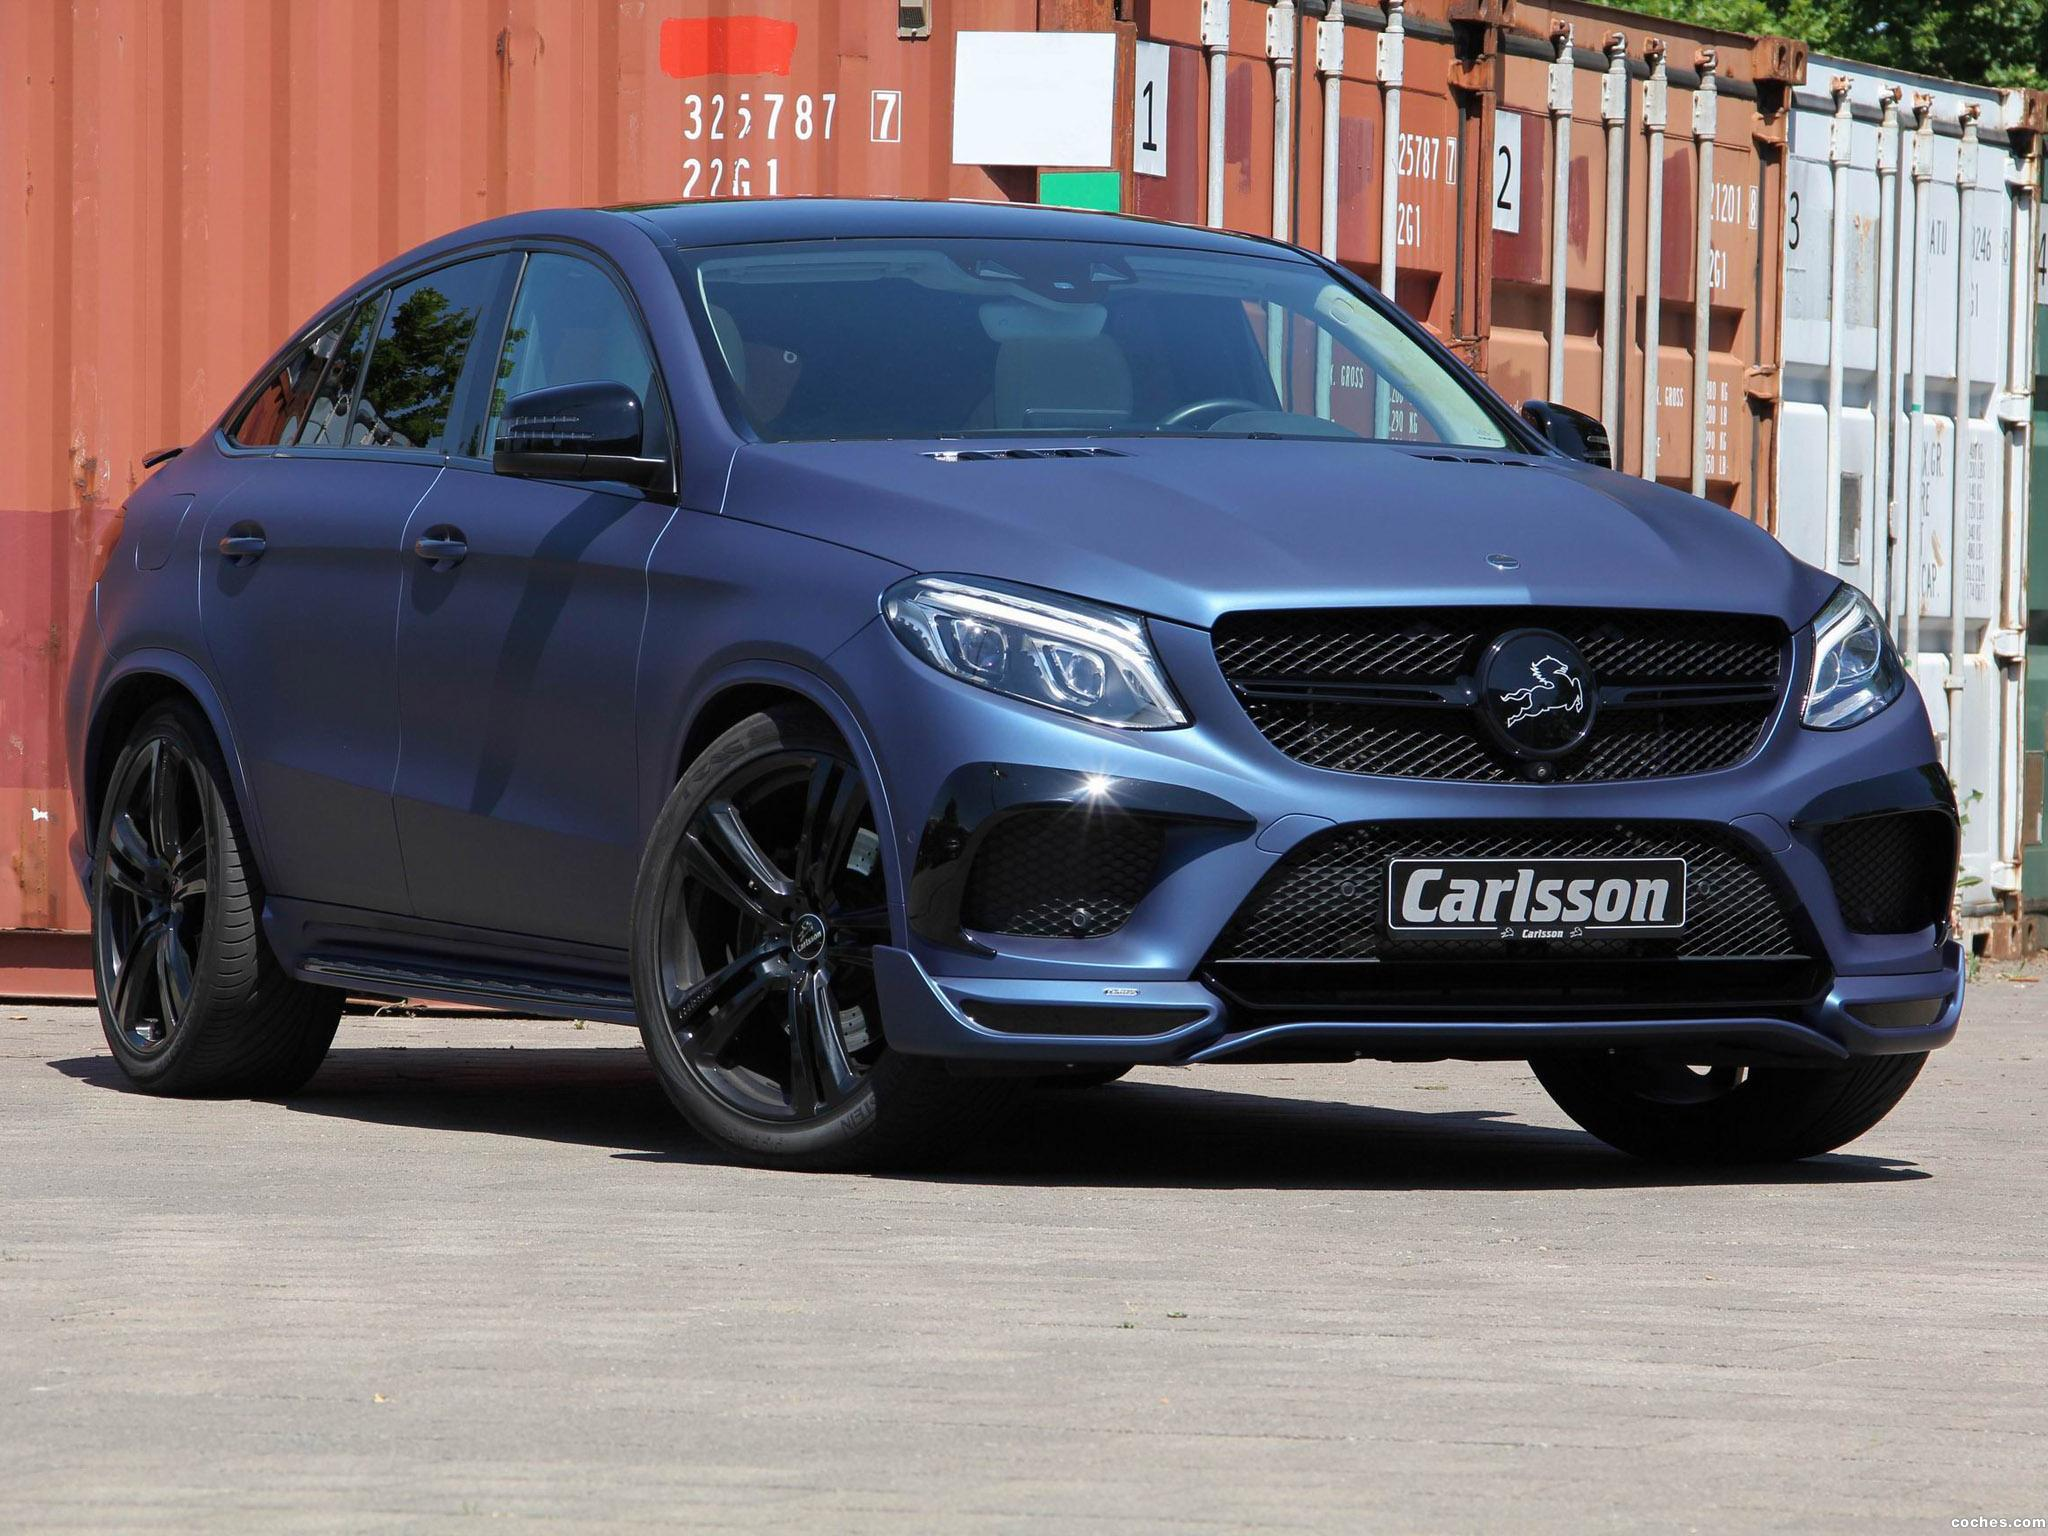 carlsson_mercedes-gle-coupe-c292-2017_r3.jpg